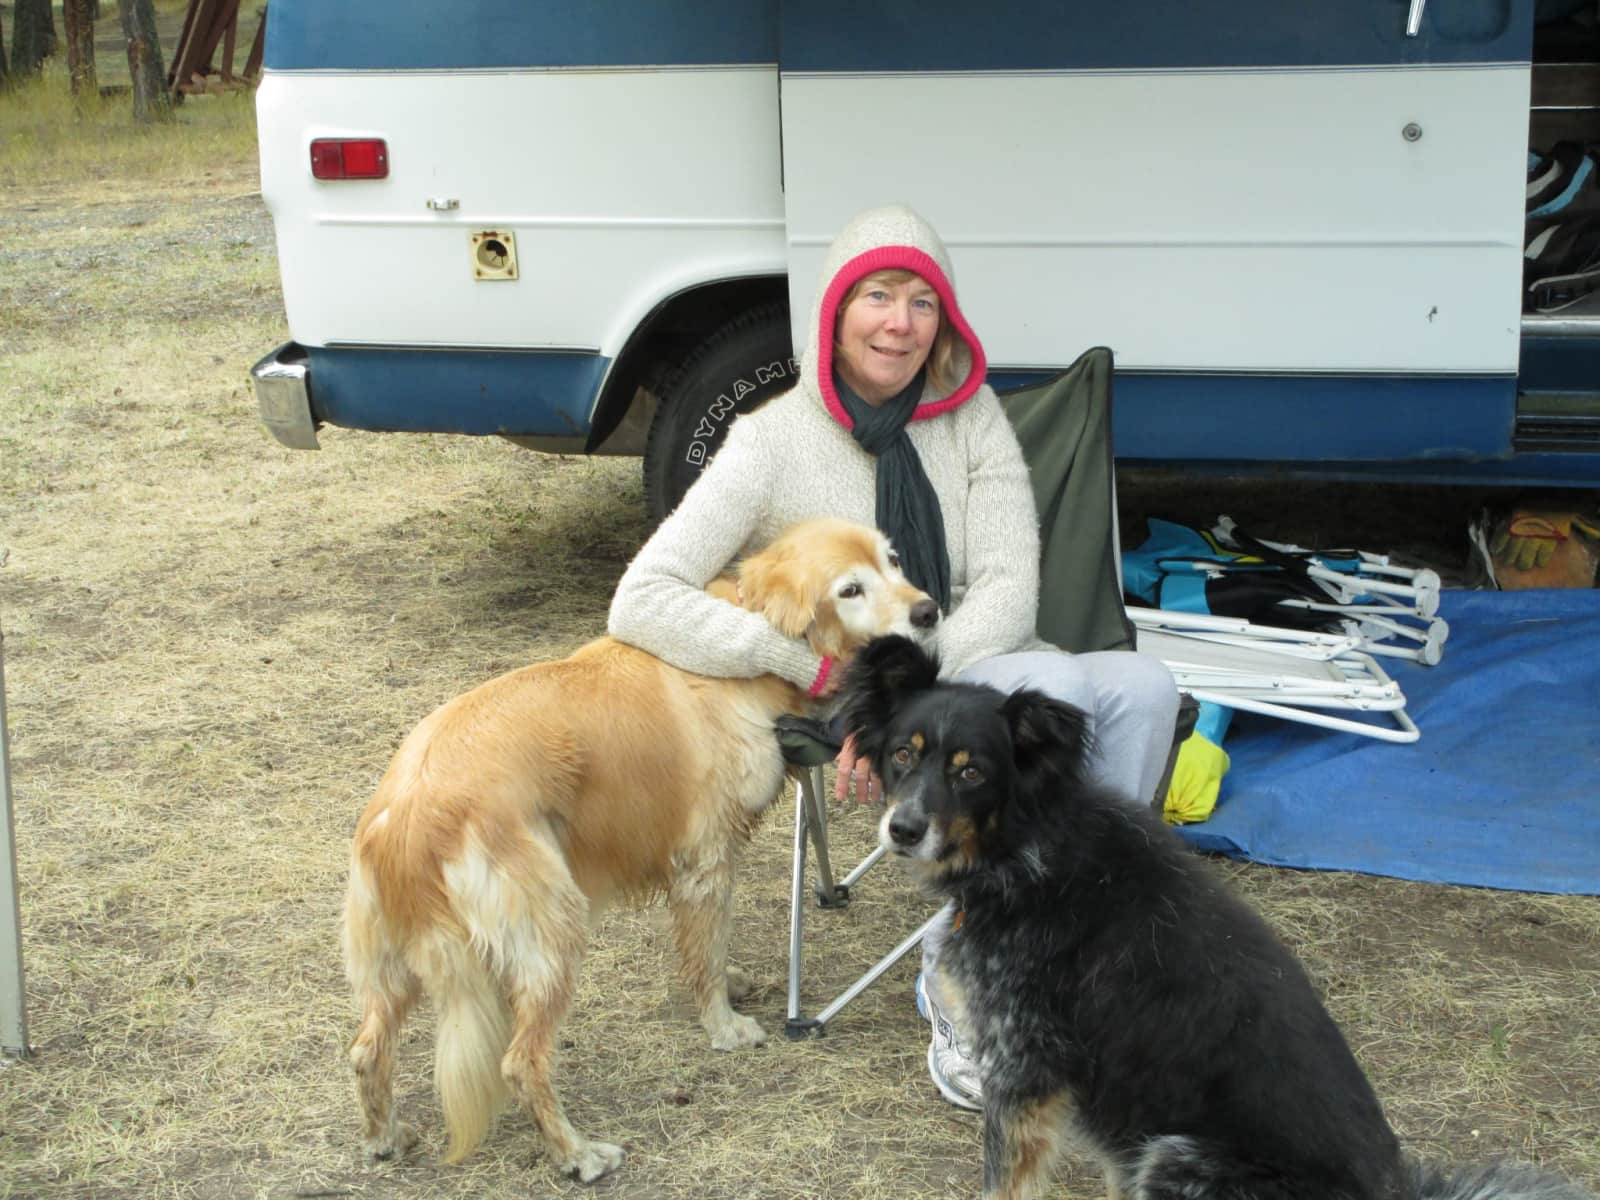 Lynn from Kamloops, British Columbia, Canada